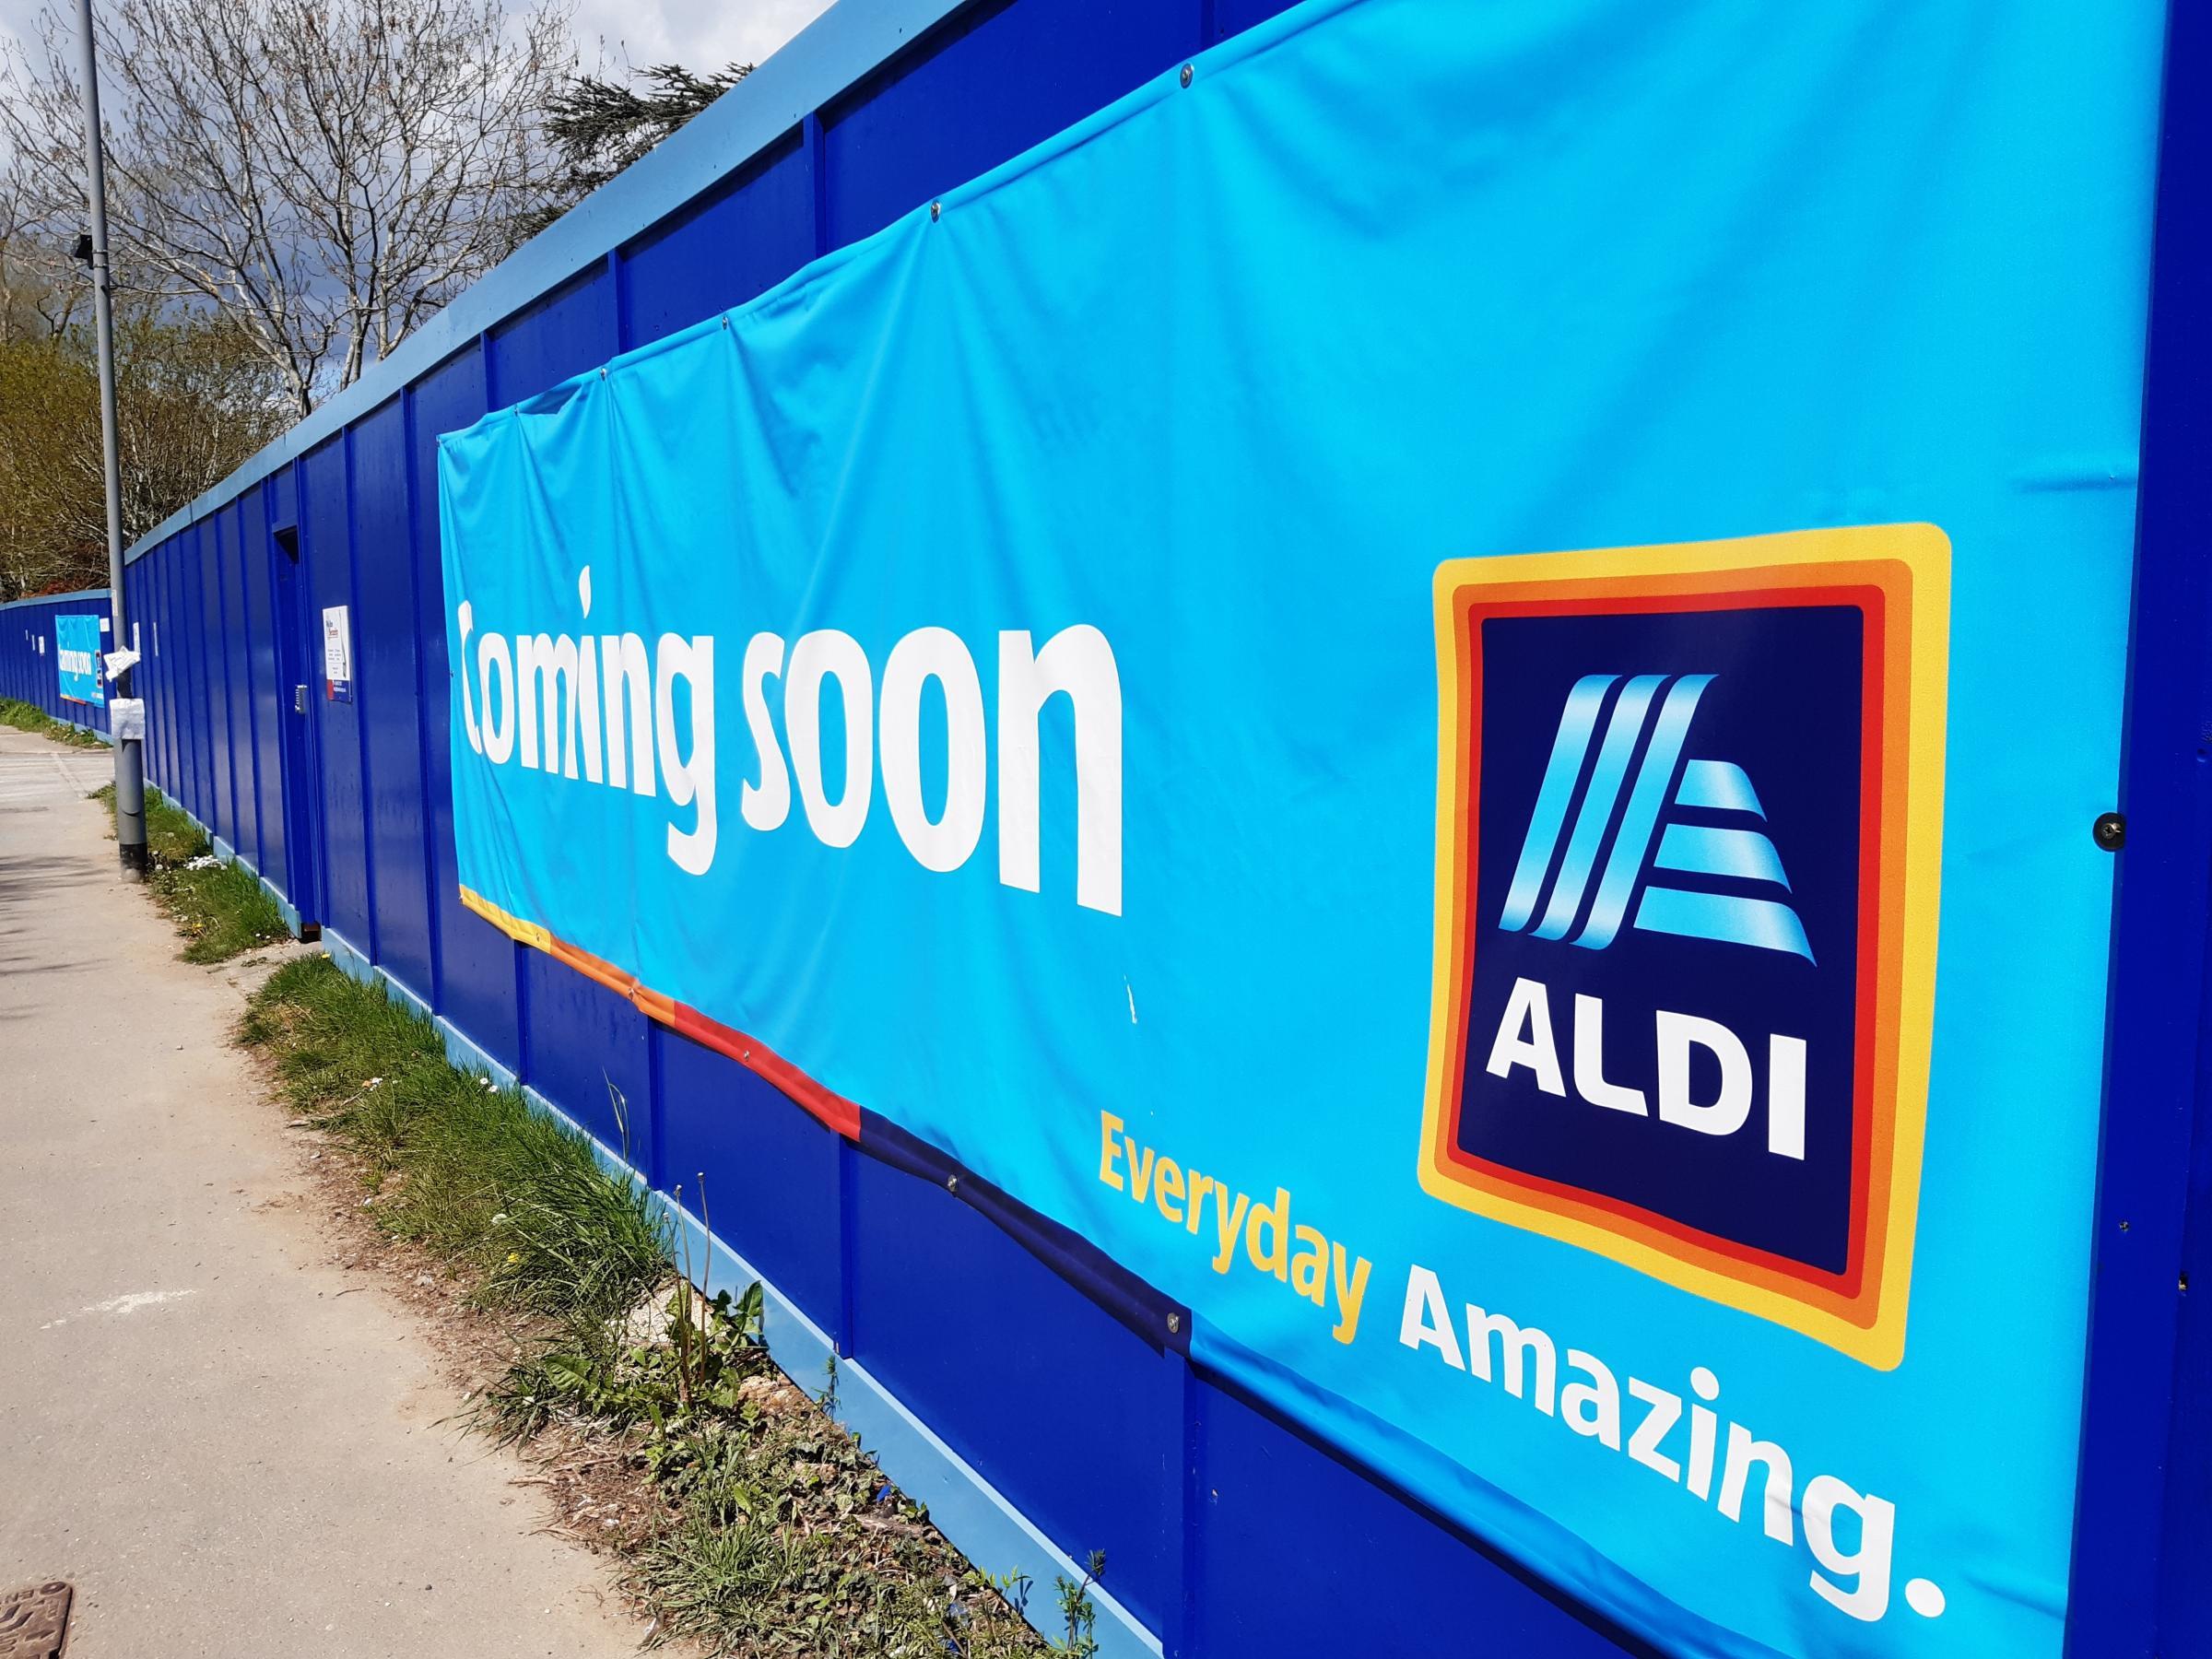 Supermarket Aldi to open new store in East Renfrewshire